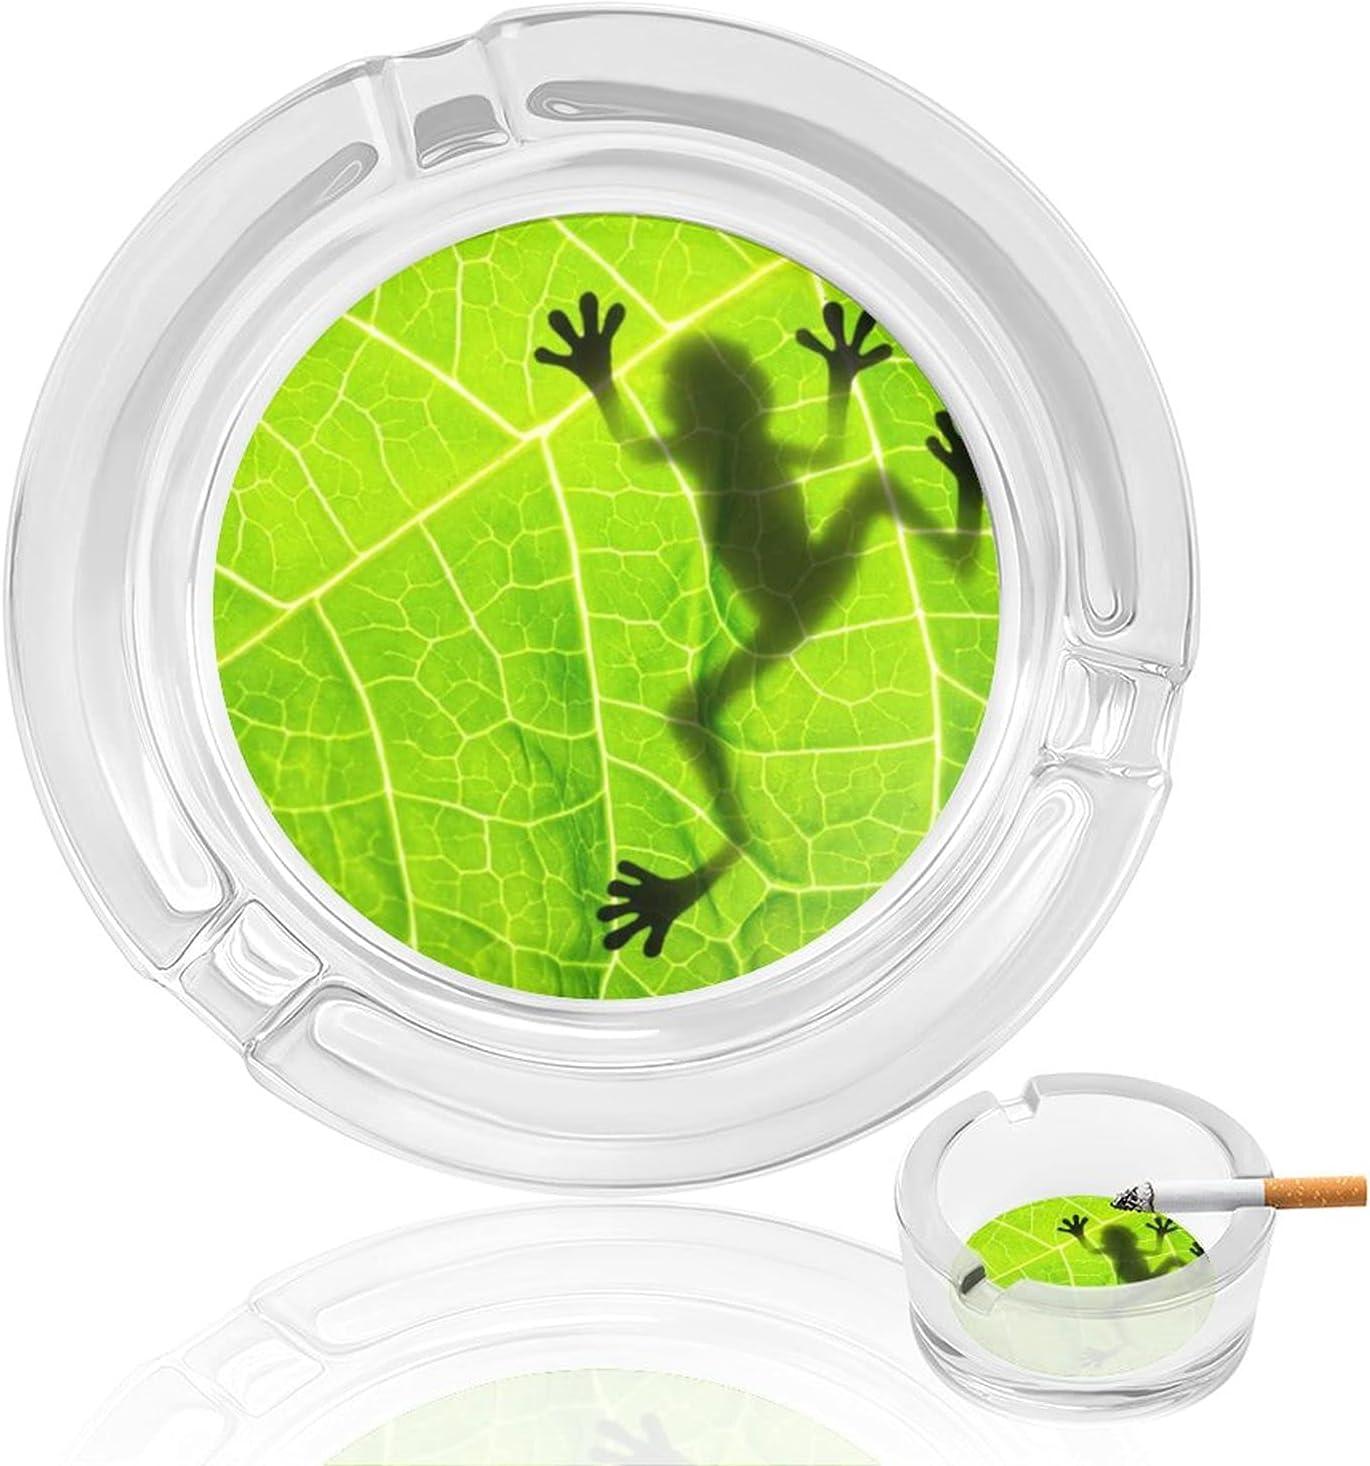 Frog Max 76% OFF Shadow On Leaf Smoking Ashtray Cigar Cigarette Ash Tr Glass Max 70% OFF